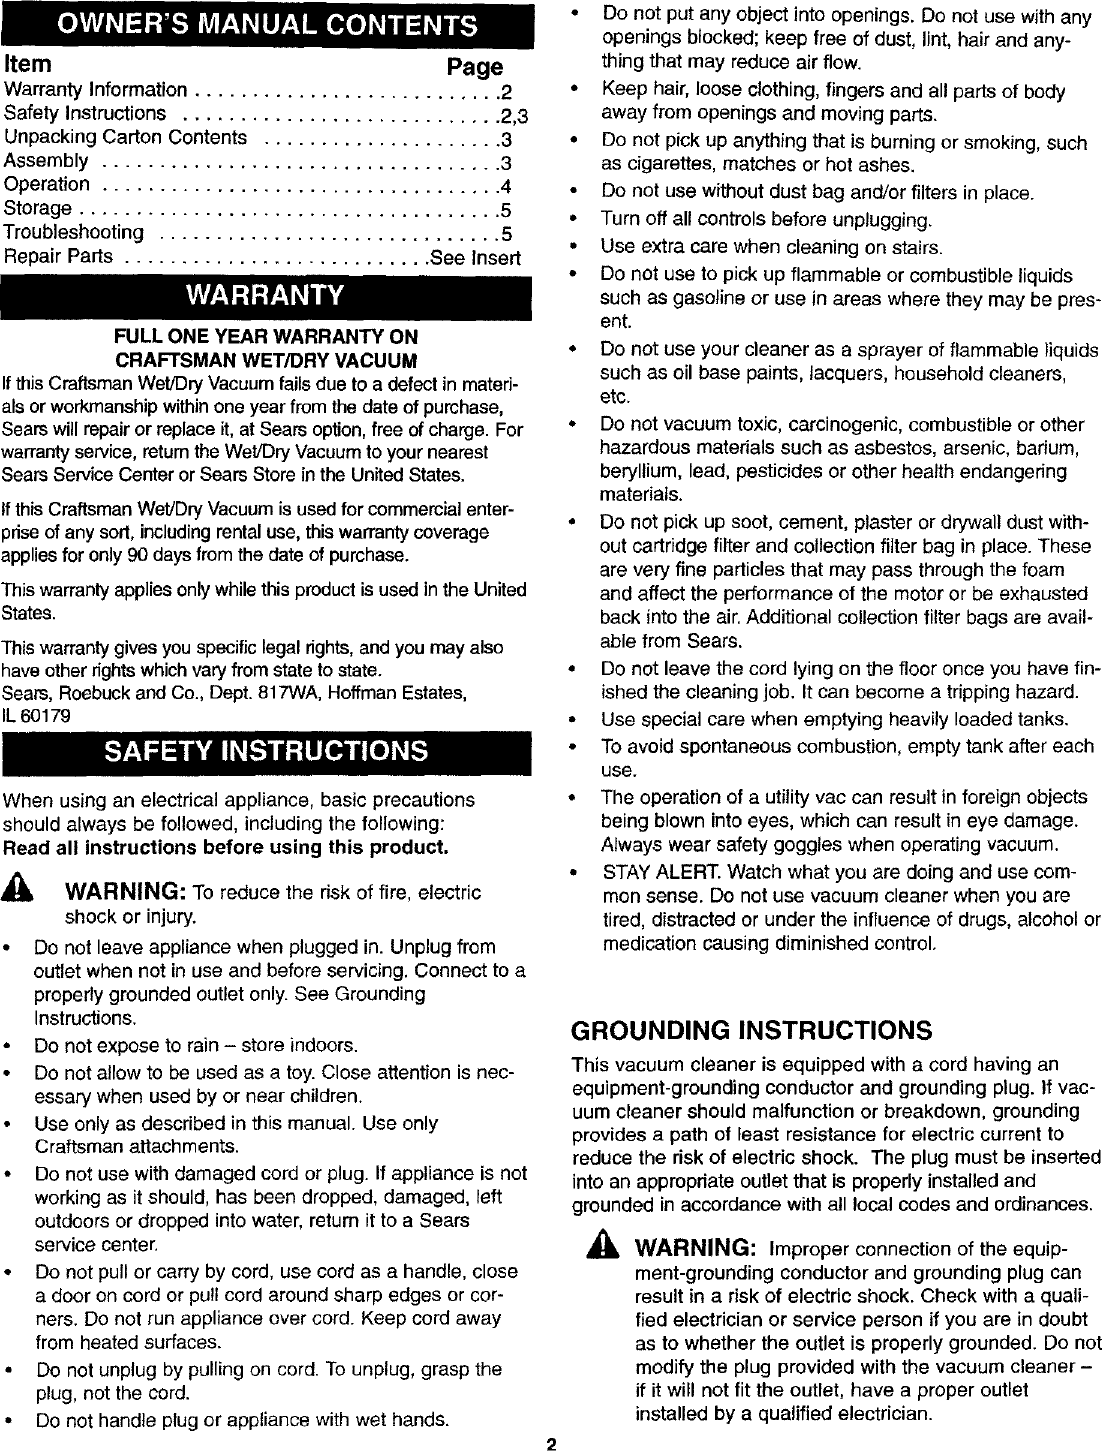 mitsubishi electric par 20maa user manual